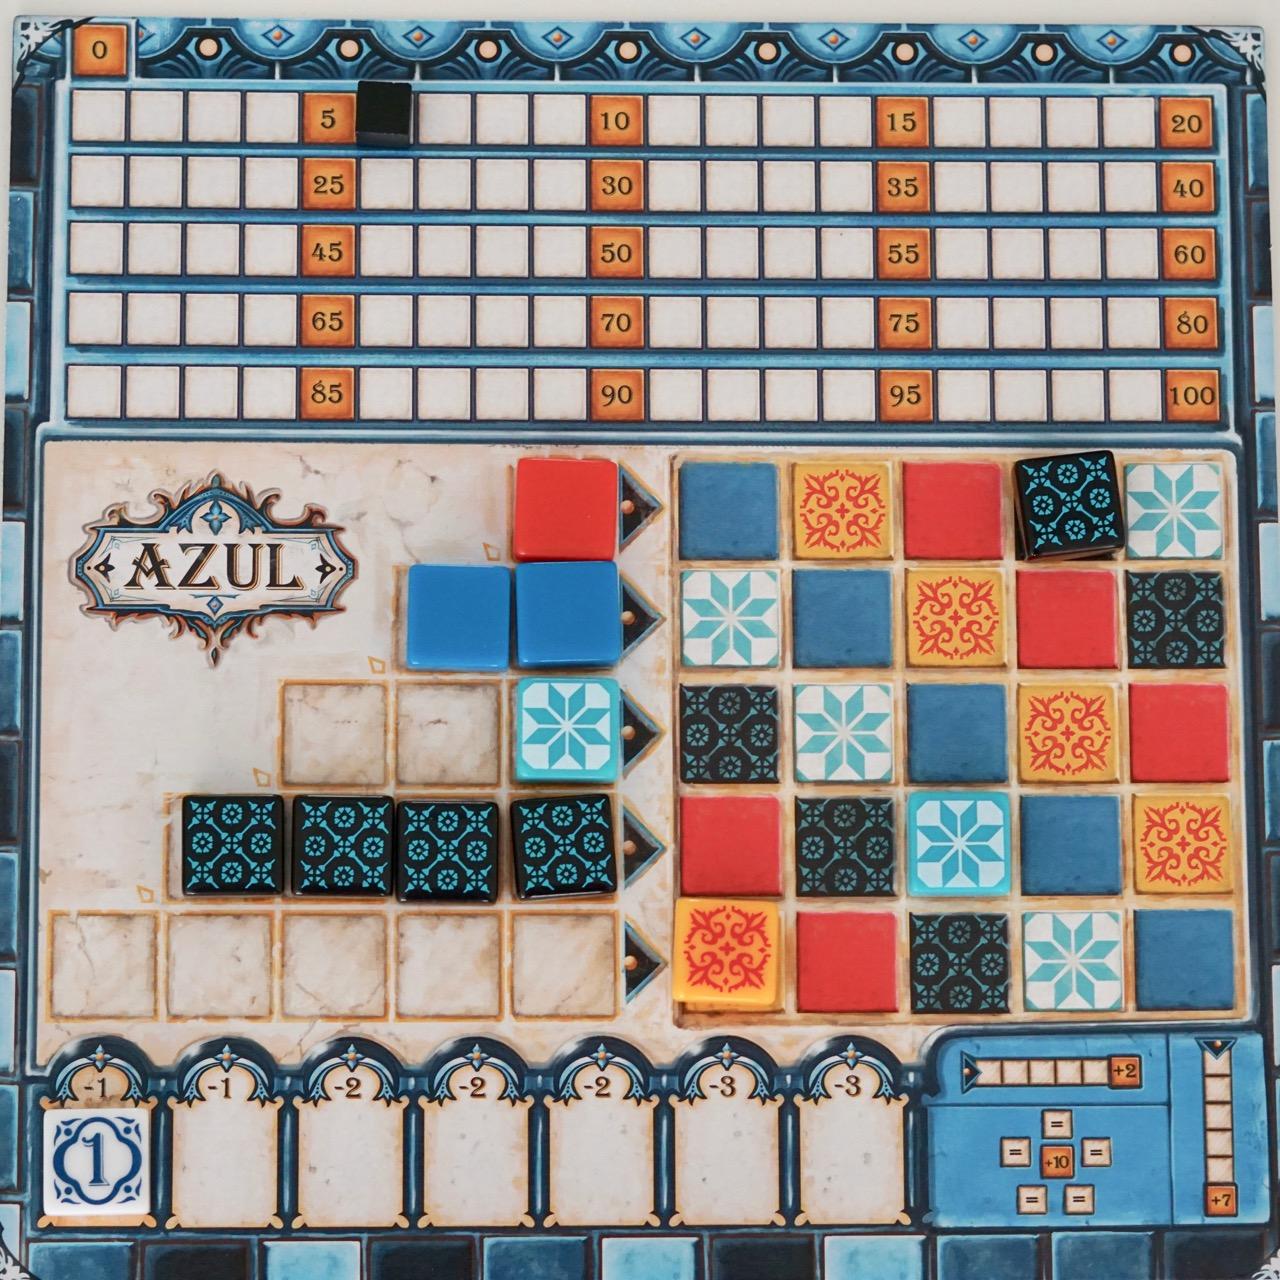 Azul Brettspiel Test